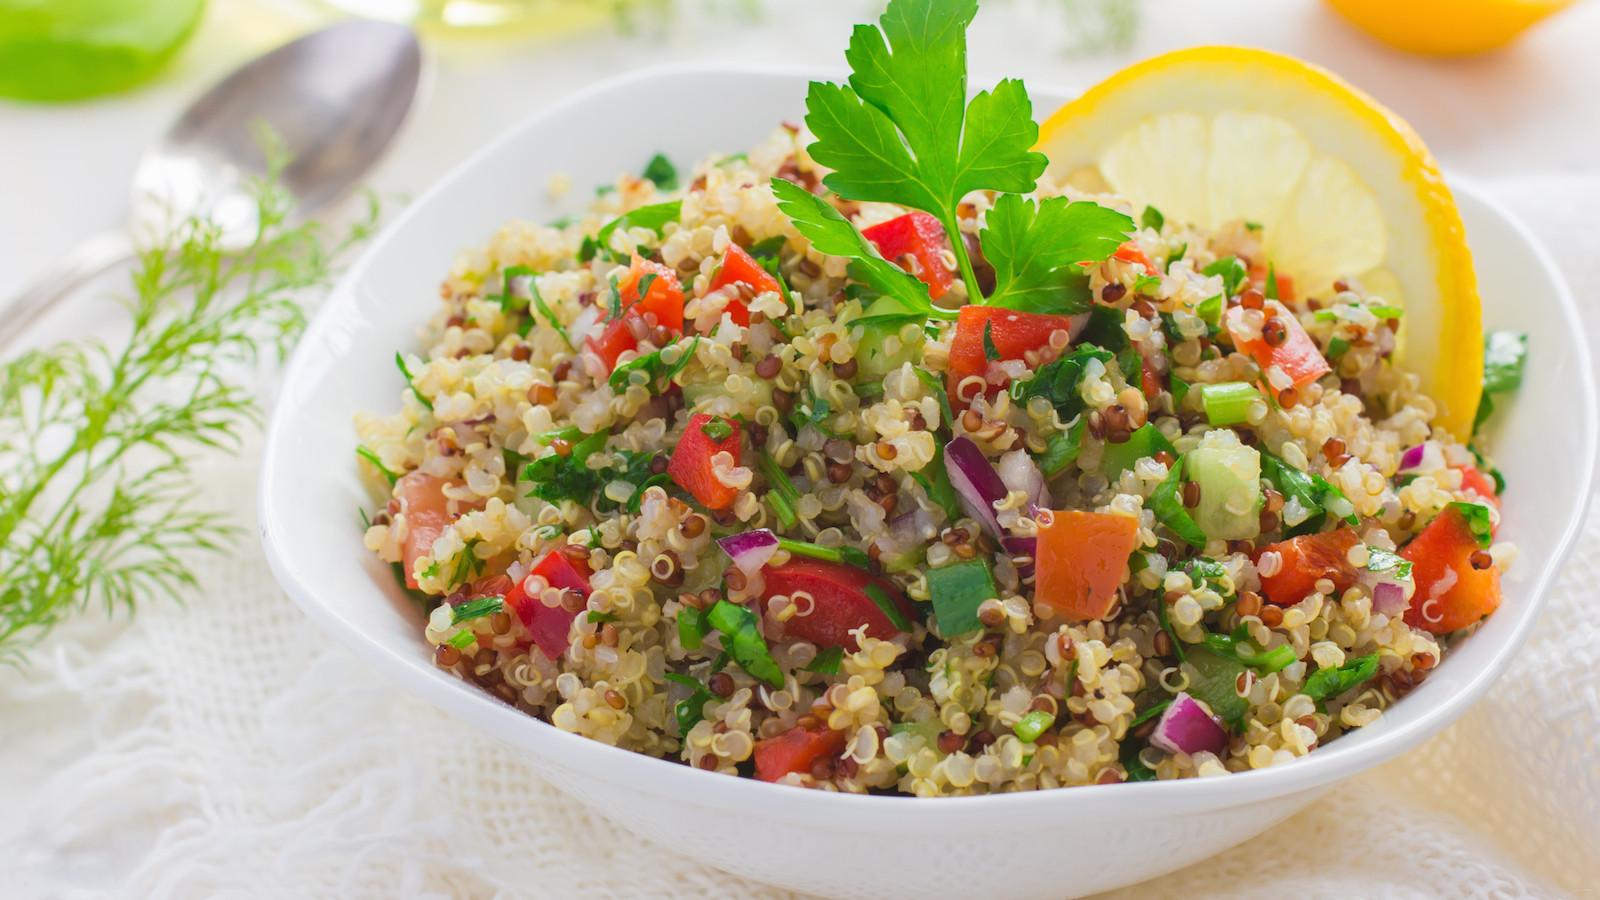 Quinoa Kosher for Passover the Best is Quinoa Kosher for Passover